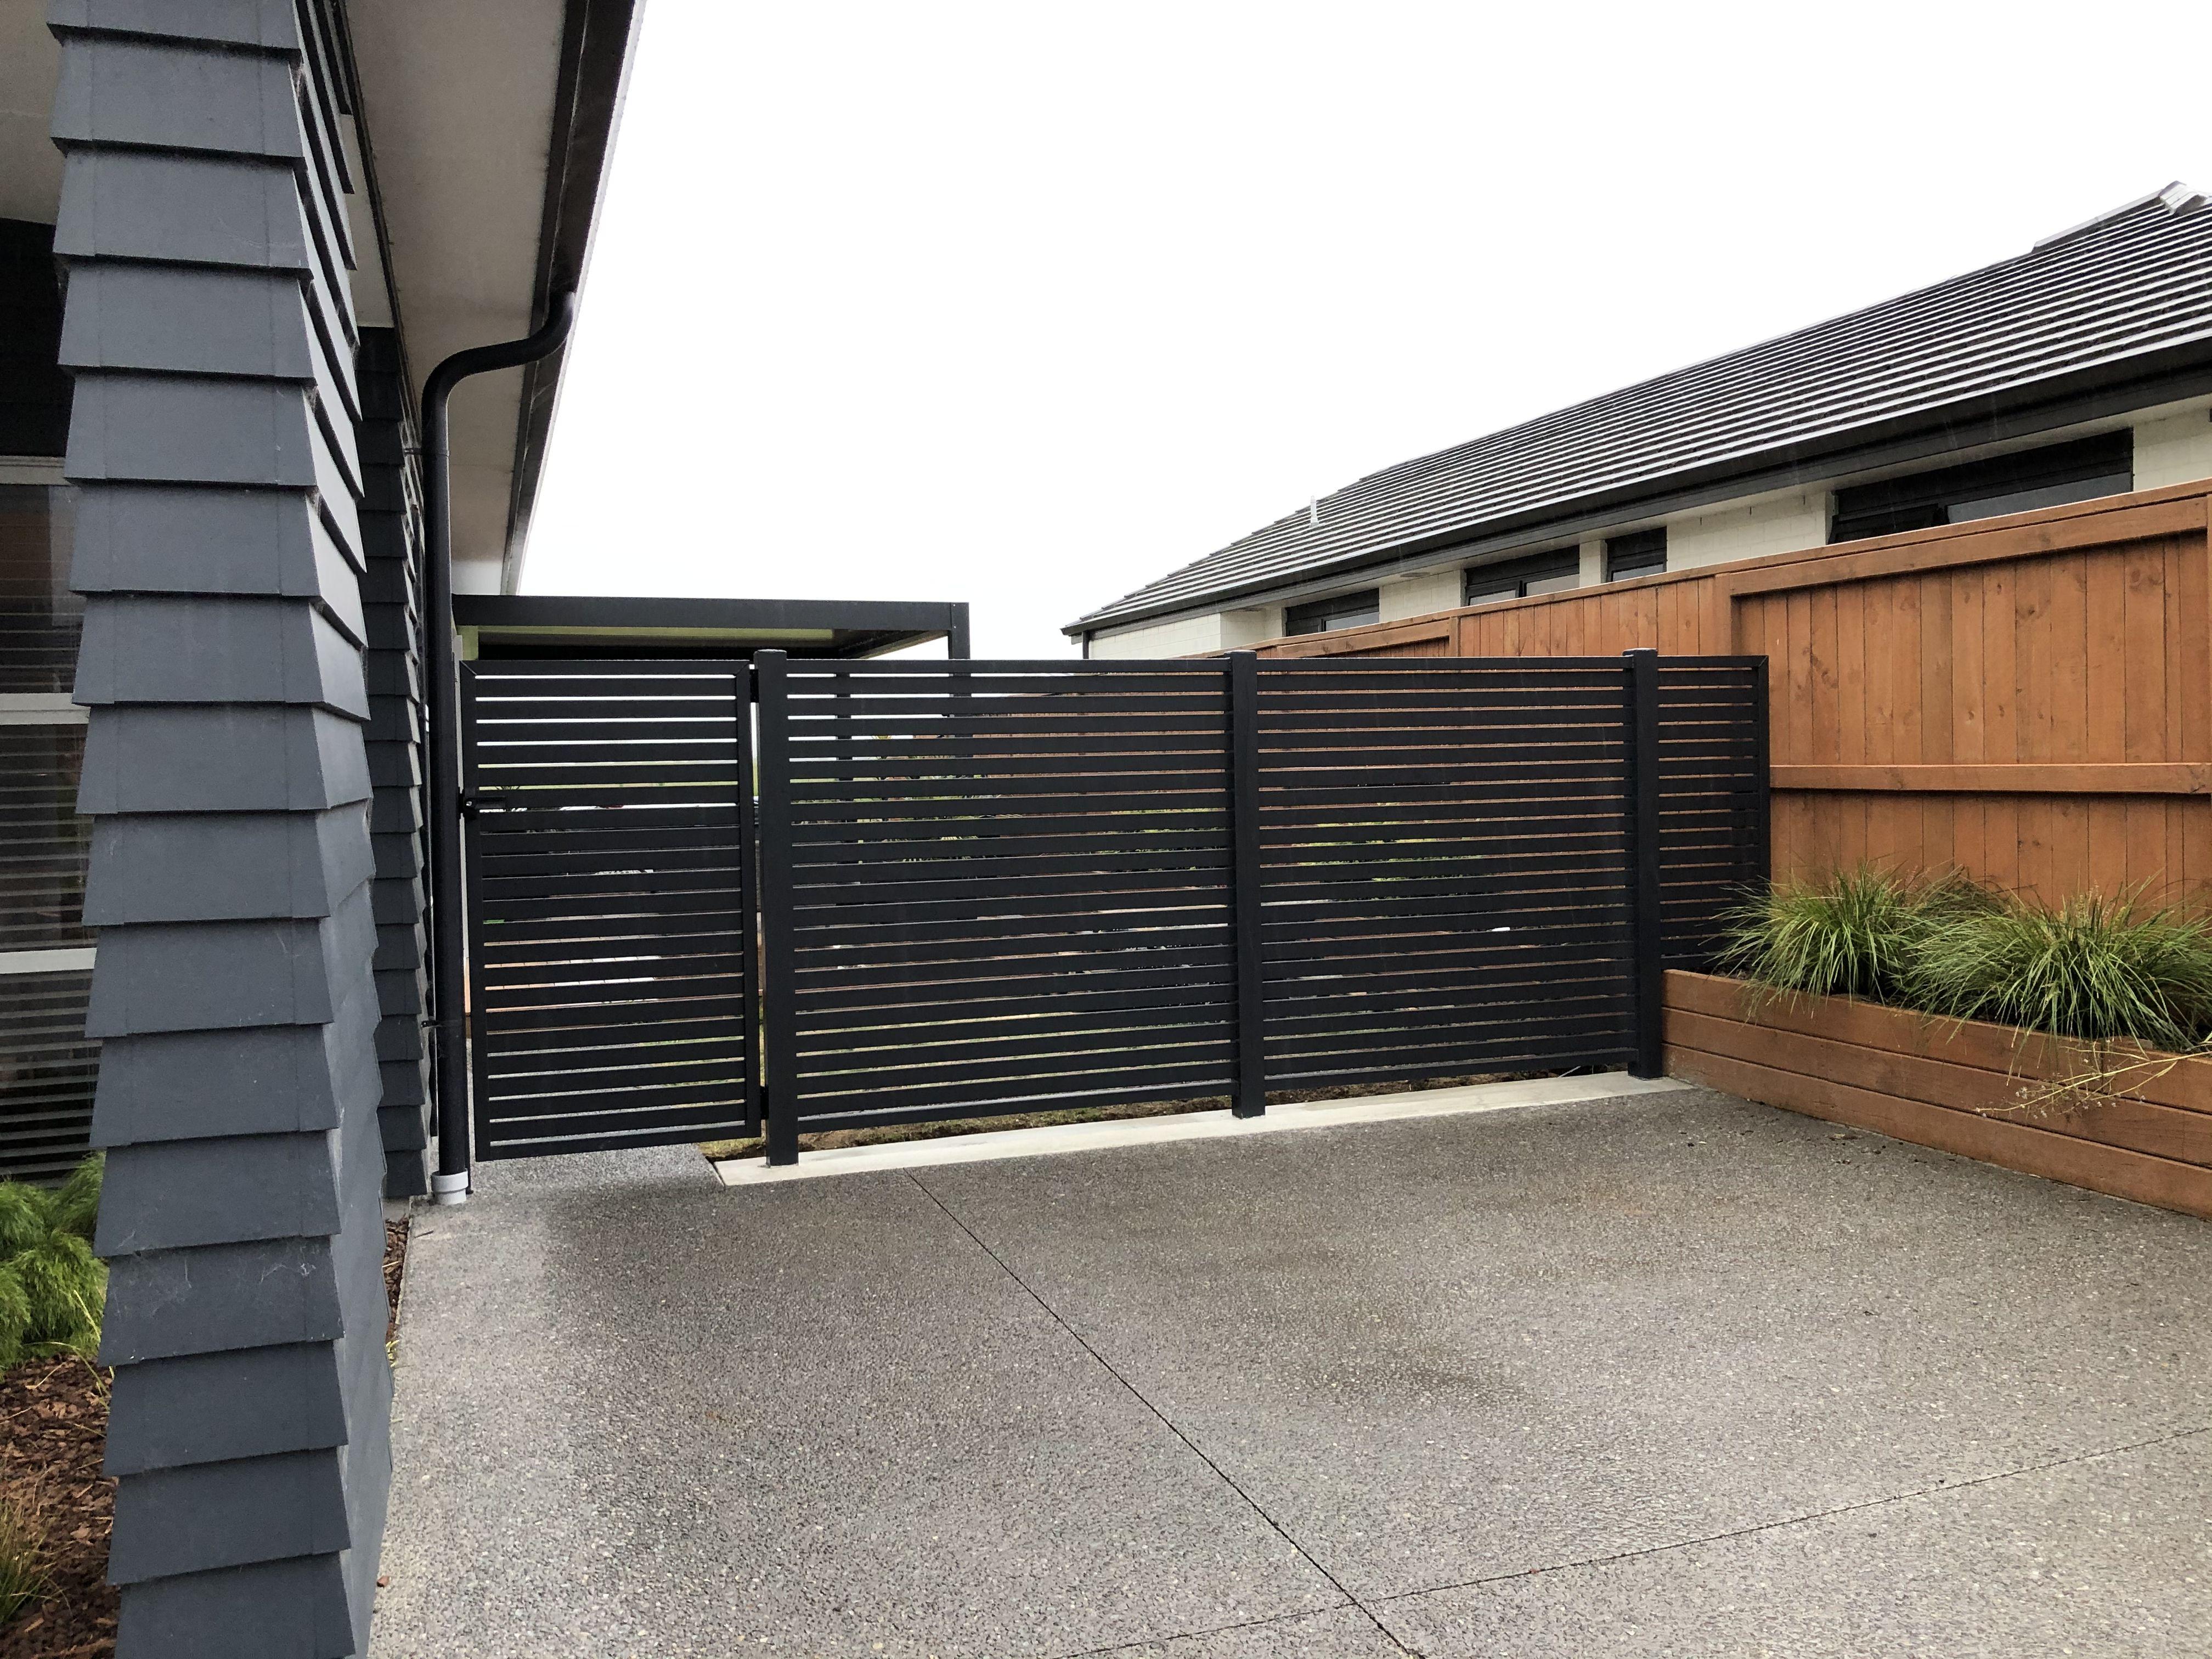 Slat Fence And Gate Fence Design Fencing Gates Fence